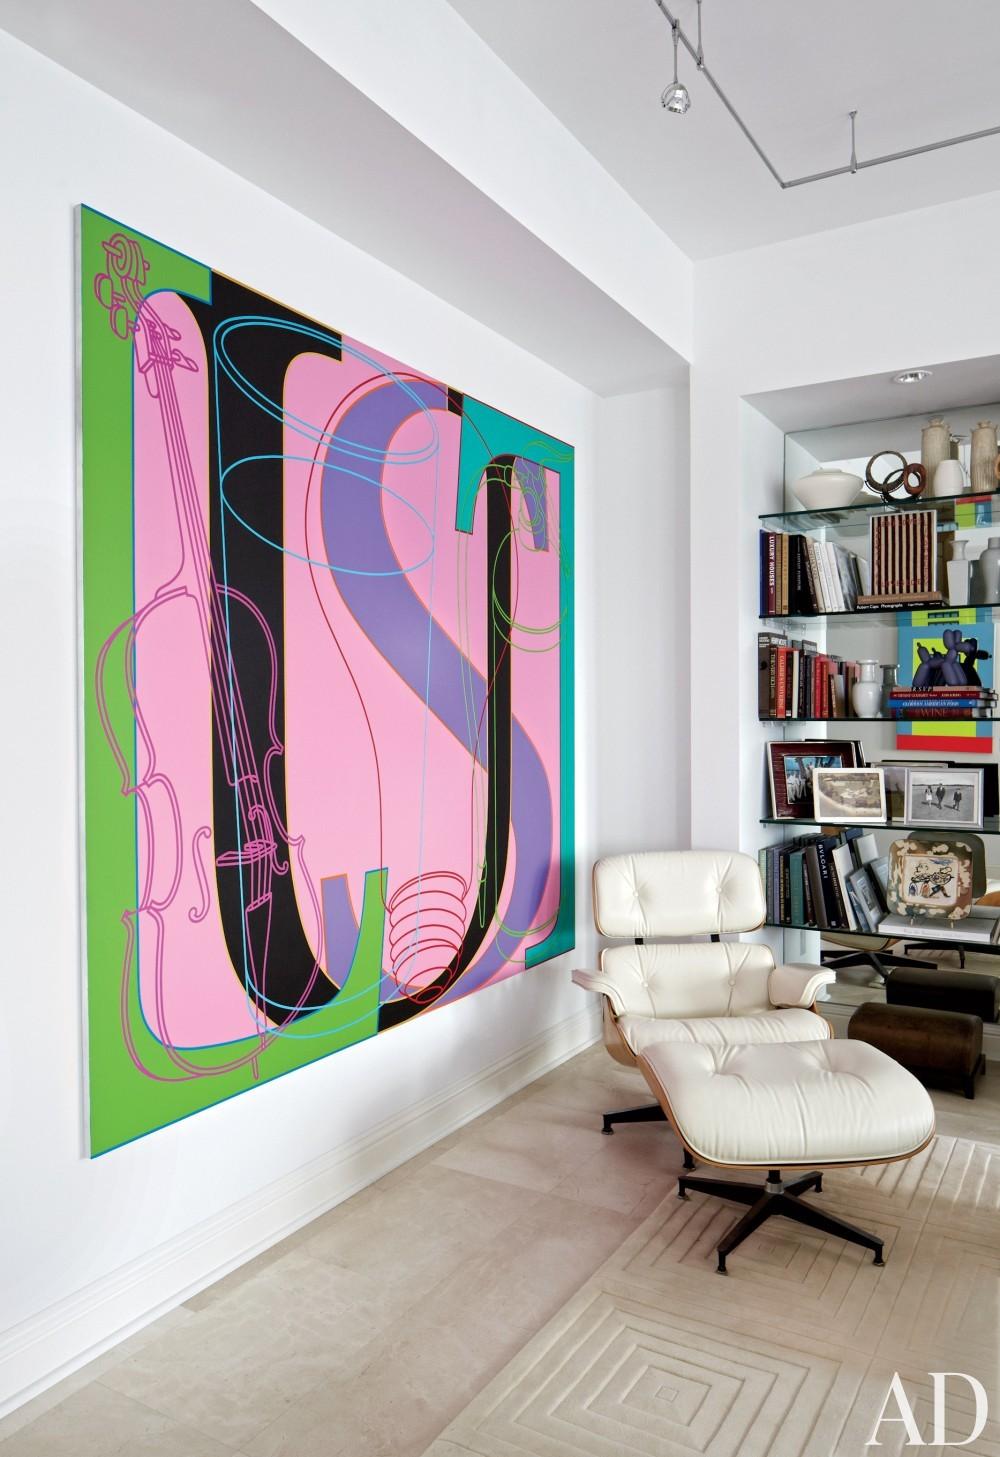 Modern Living Room by Vicente Wolf Associates Inc. in Palm Beach, FL